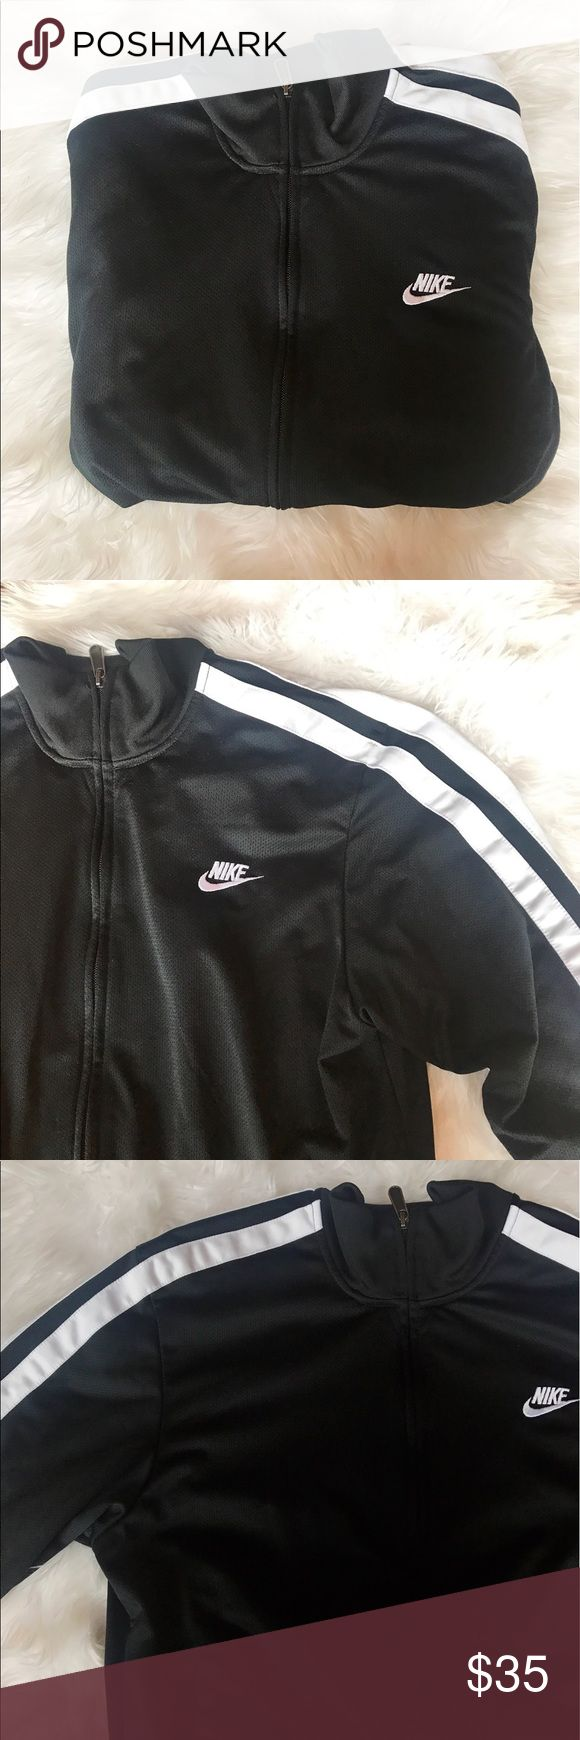 Nike track jacket No trades Nike Jackets & Coats